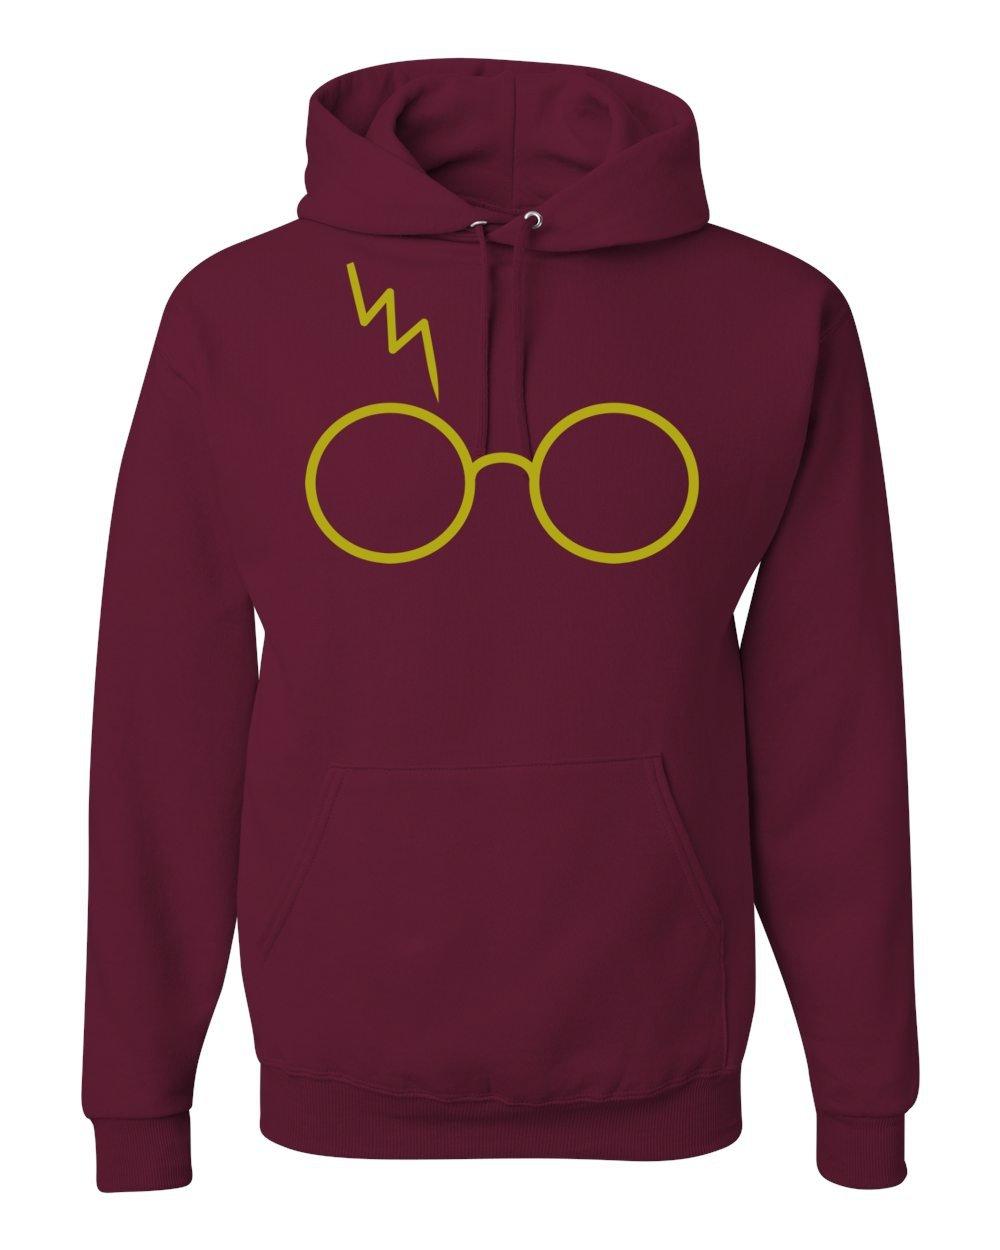 Gold Harry Potter Glasses Scar Unisex Hooded Sweatshirt Fashion Hoodie ( Maroon , Large )